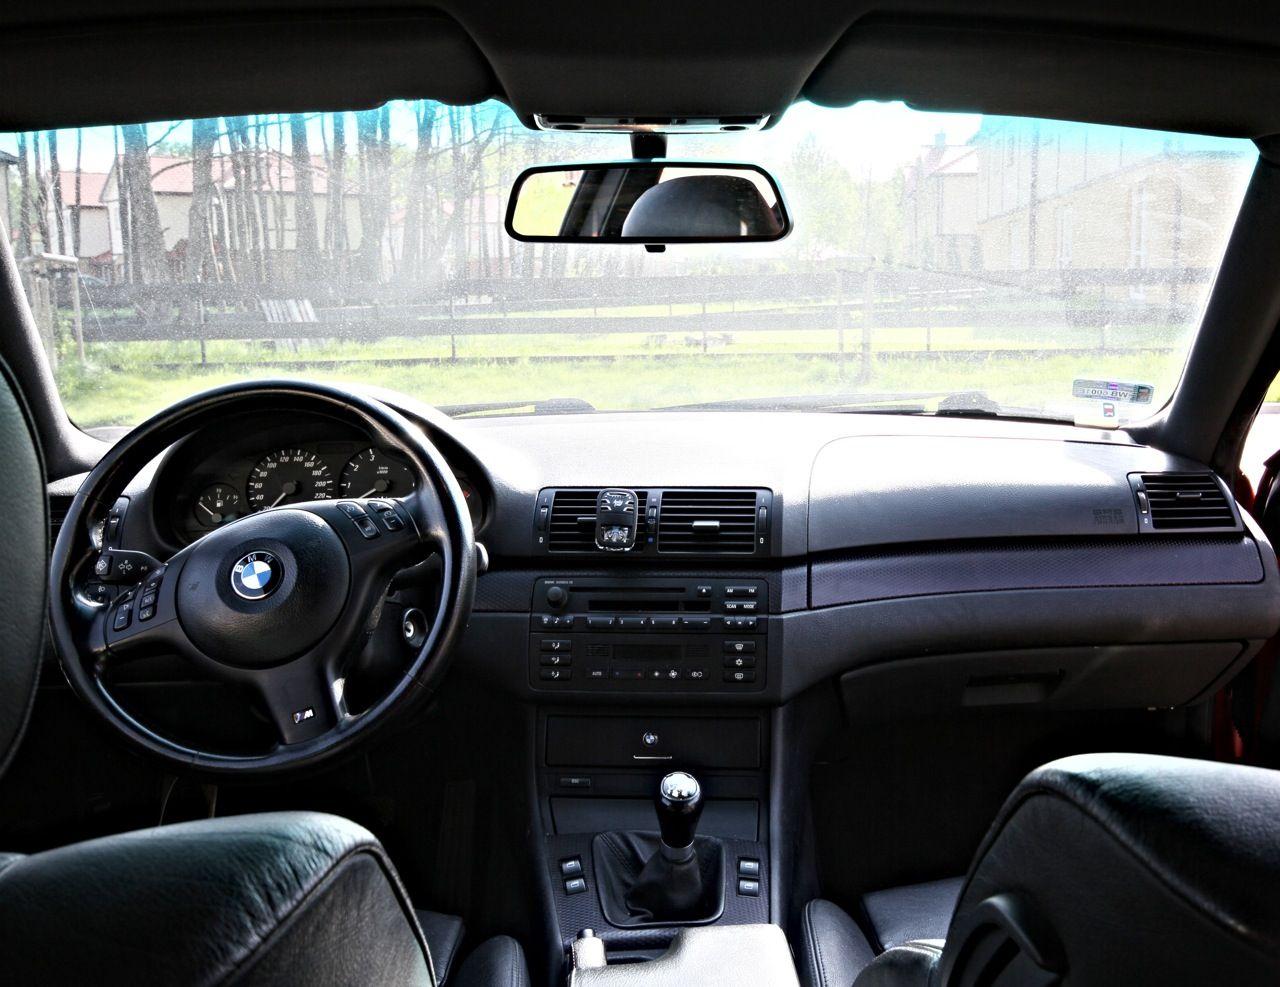 bmw e46 325ci coupe black leather interior cars bmw